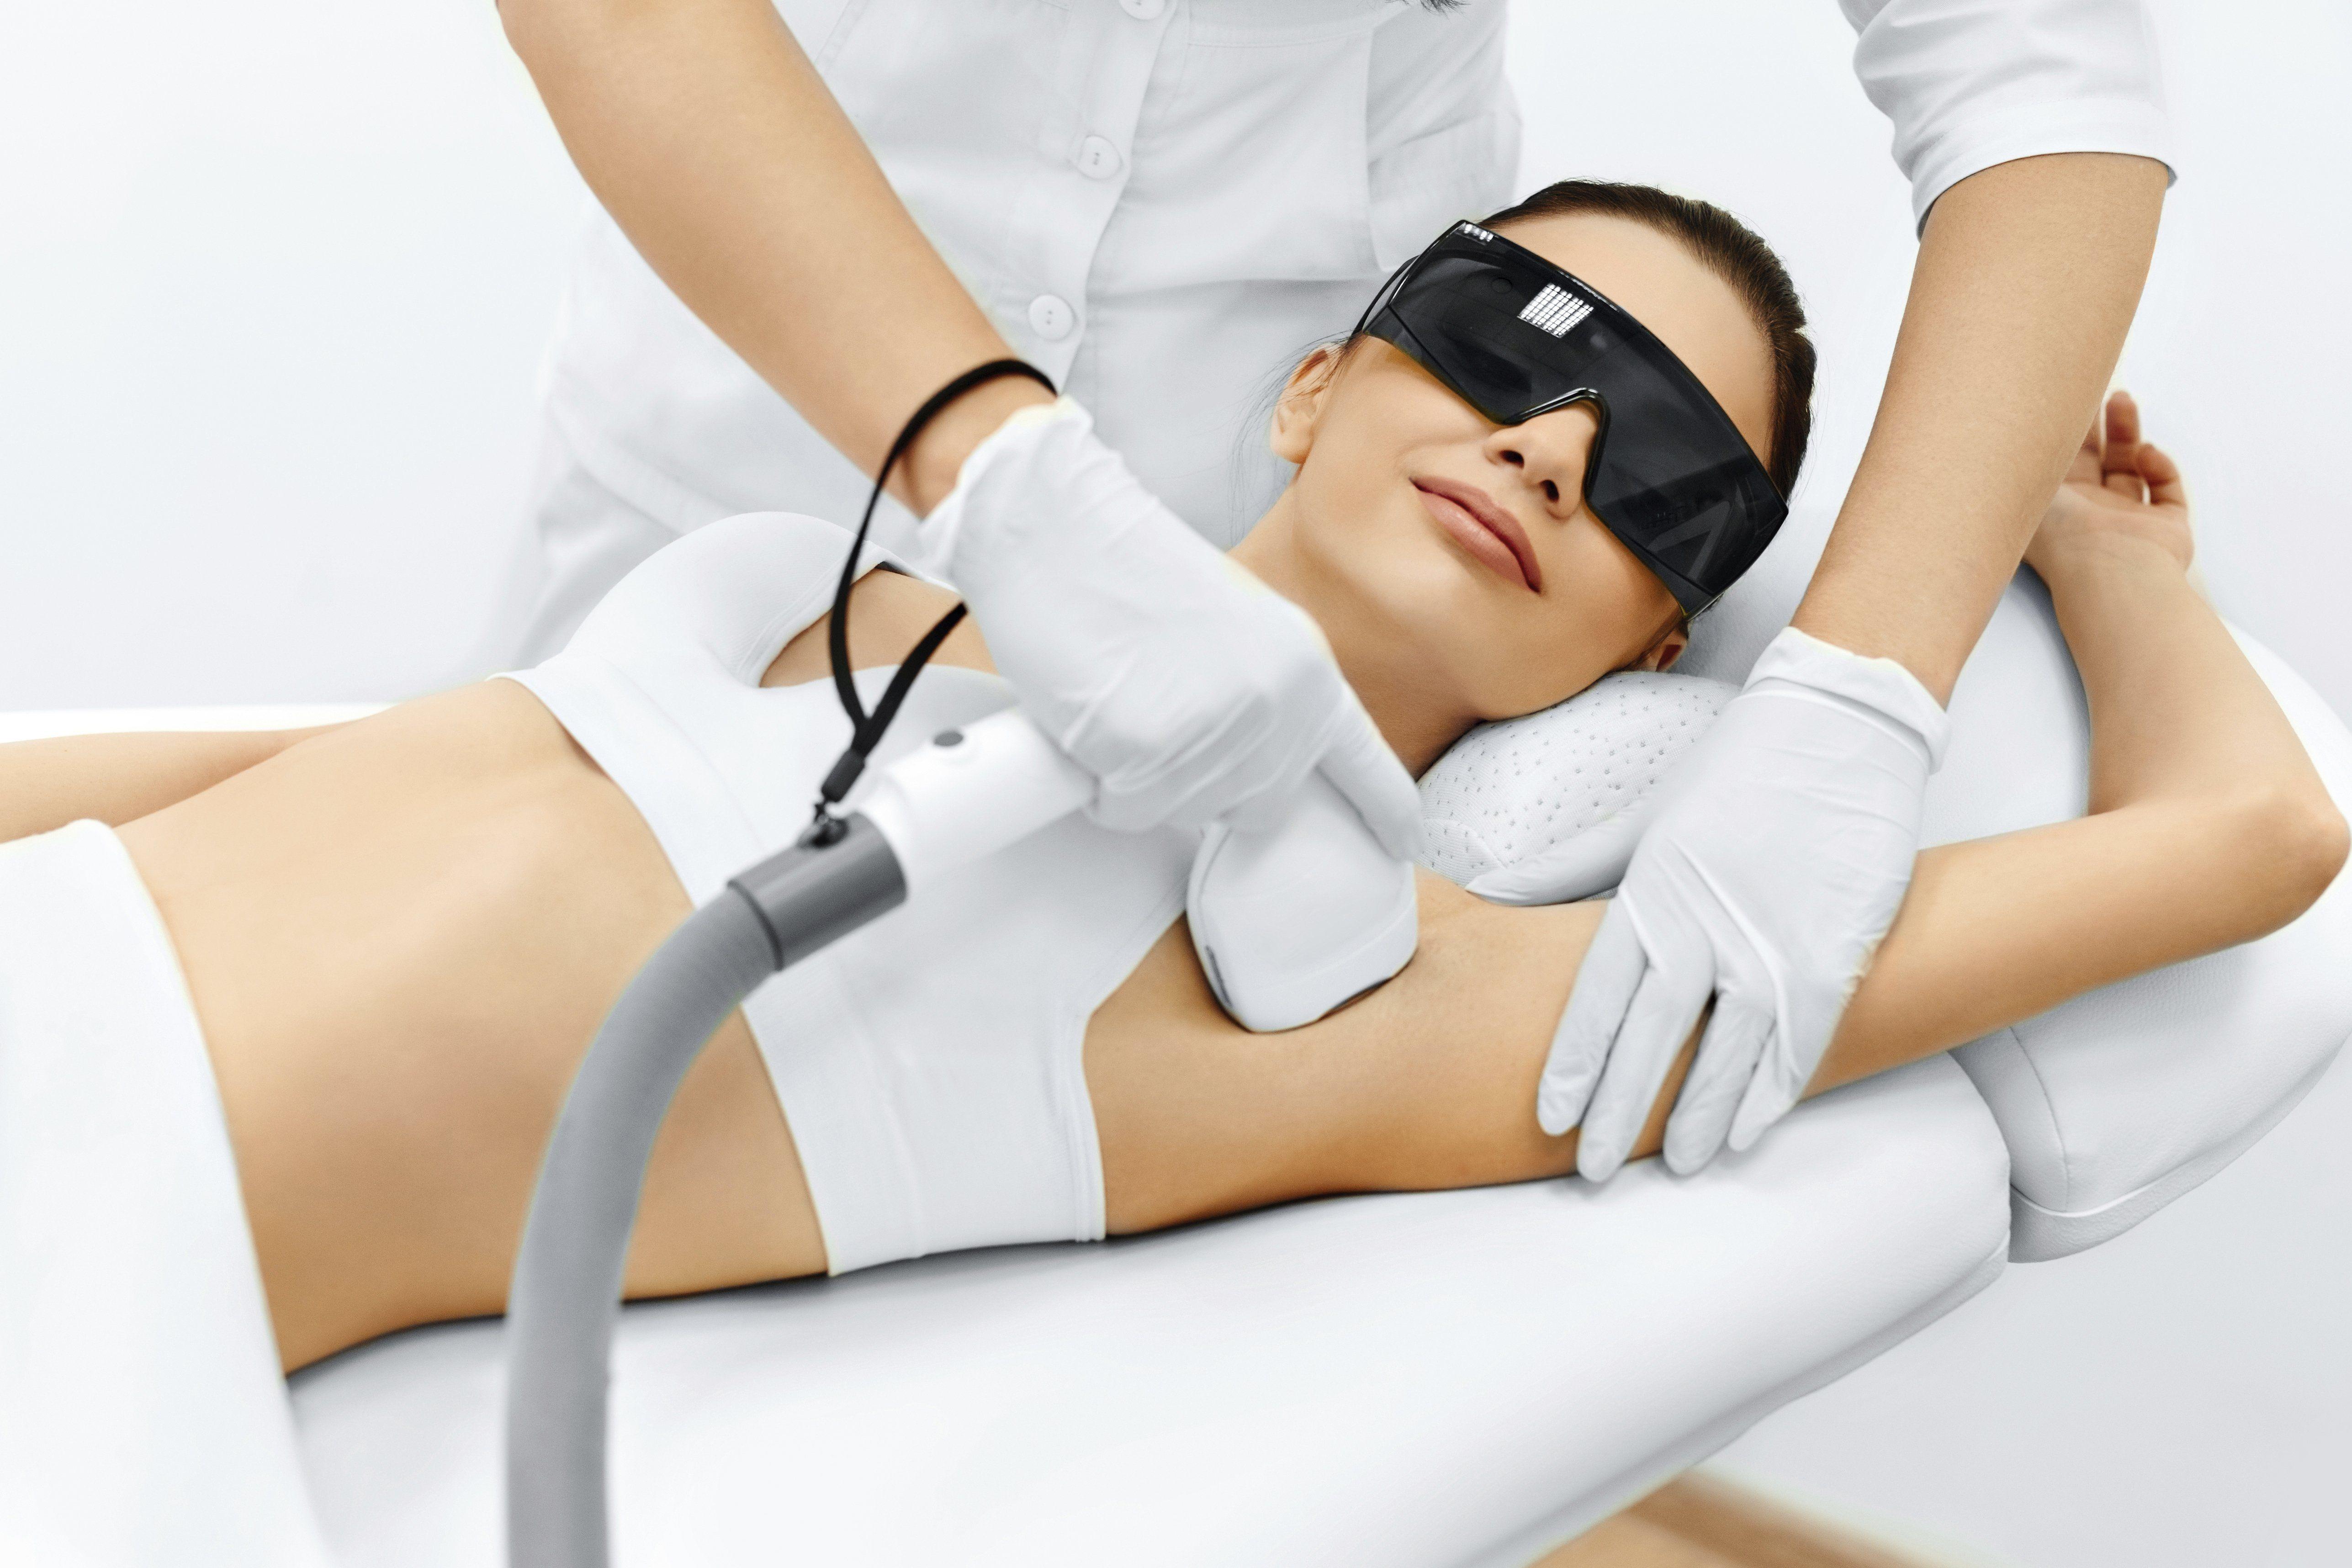 Depilación láser: Tratamientos de Centro de Medicina Estética  Mery Vázquez